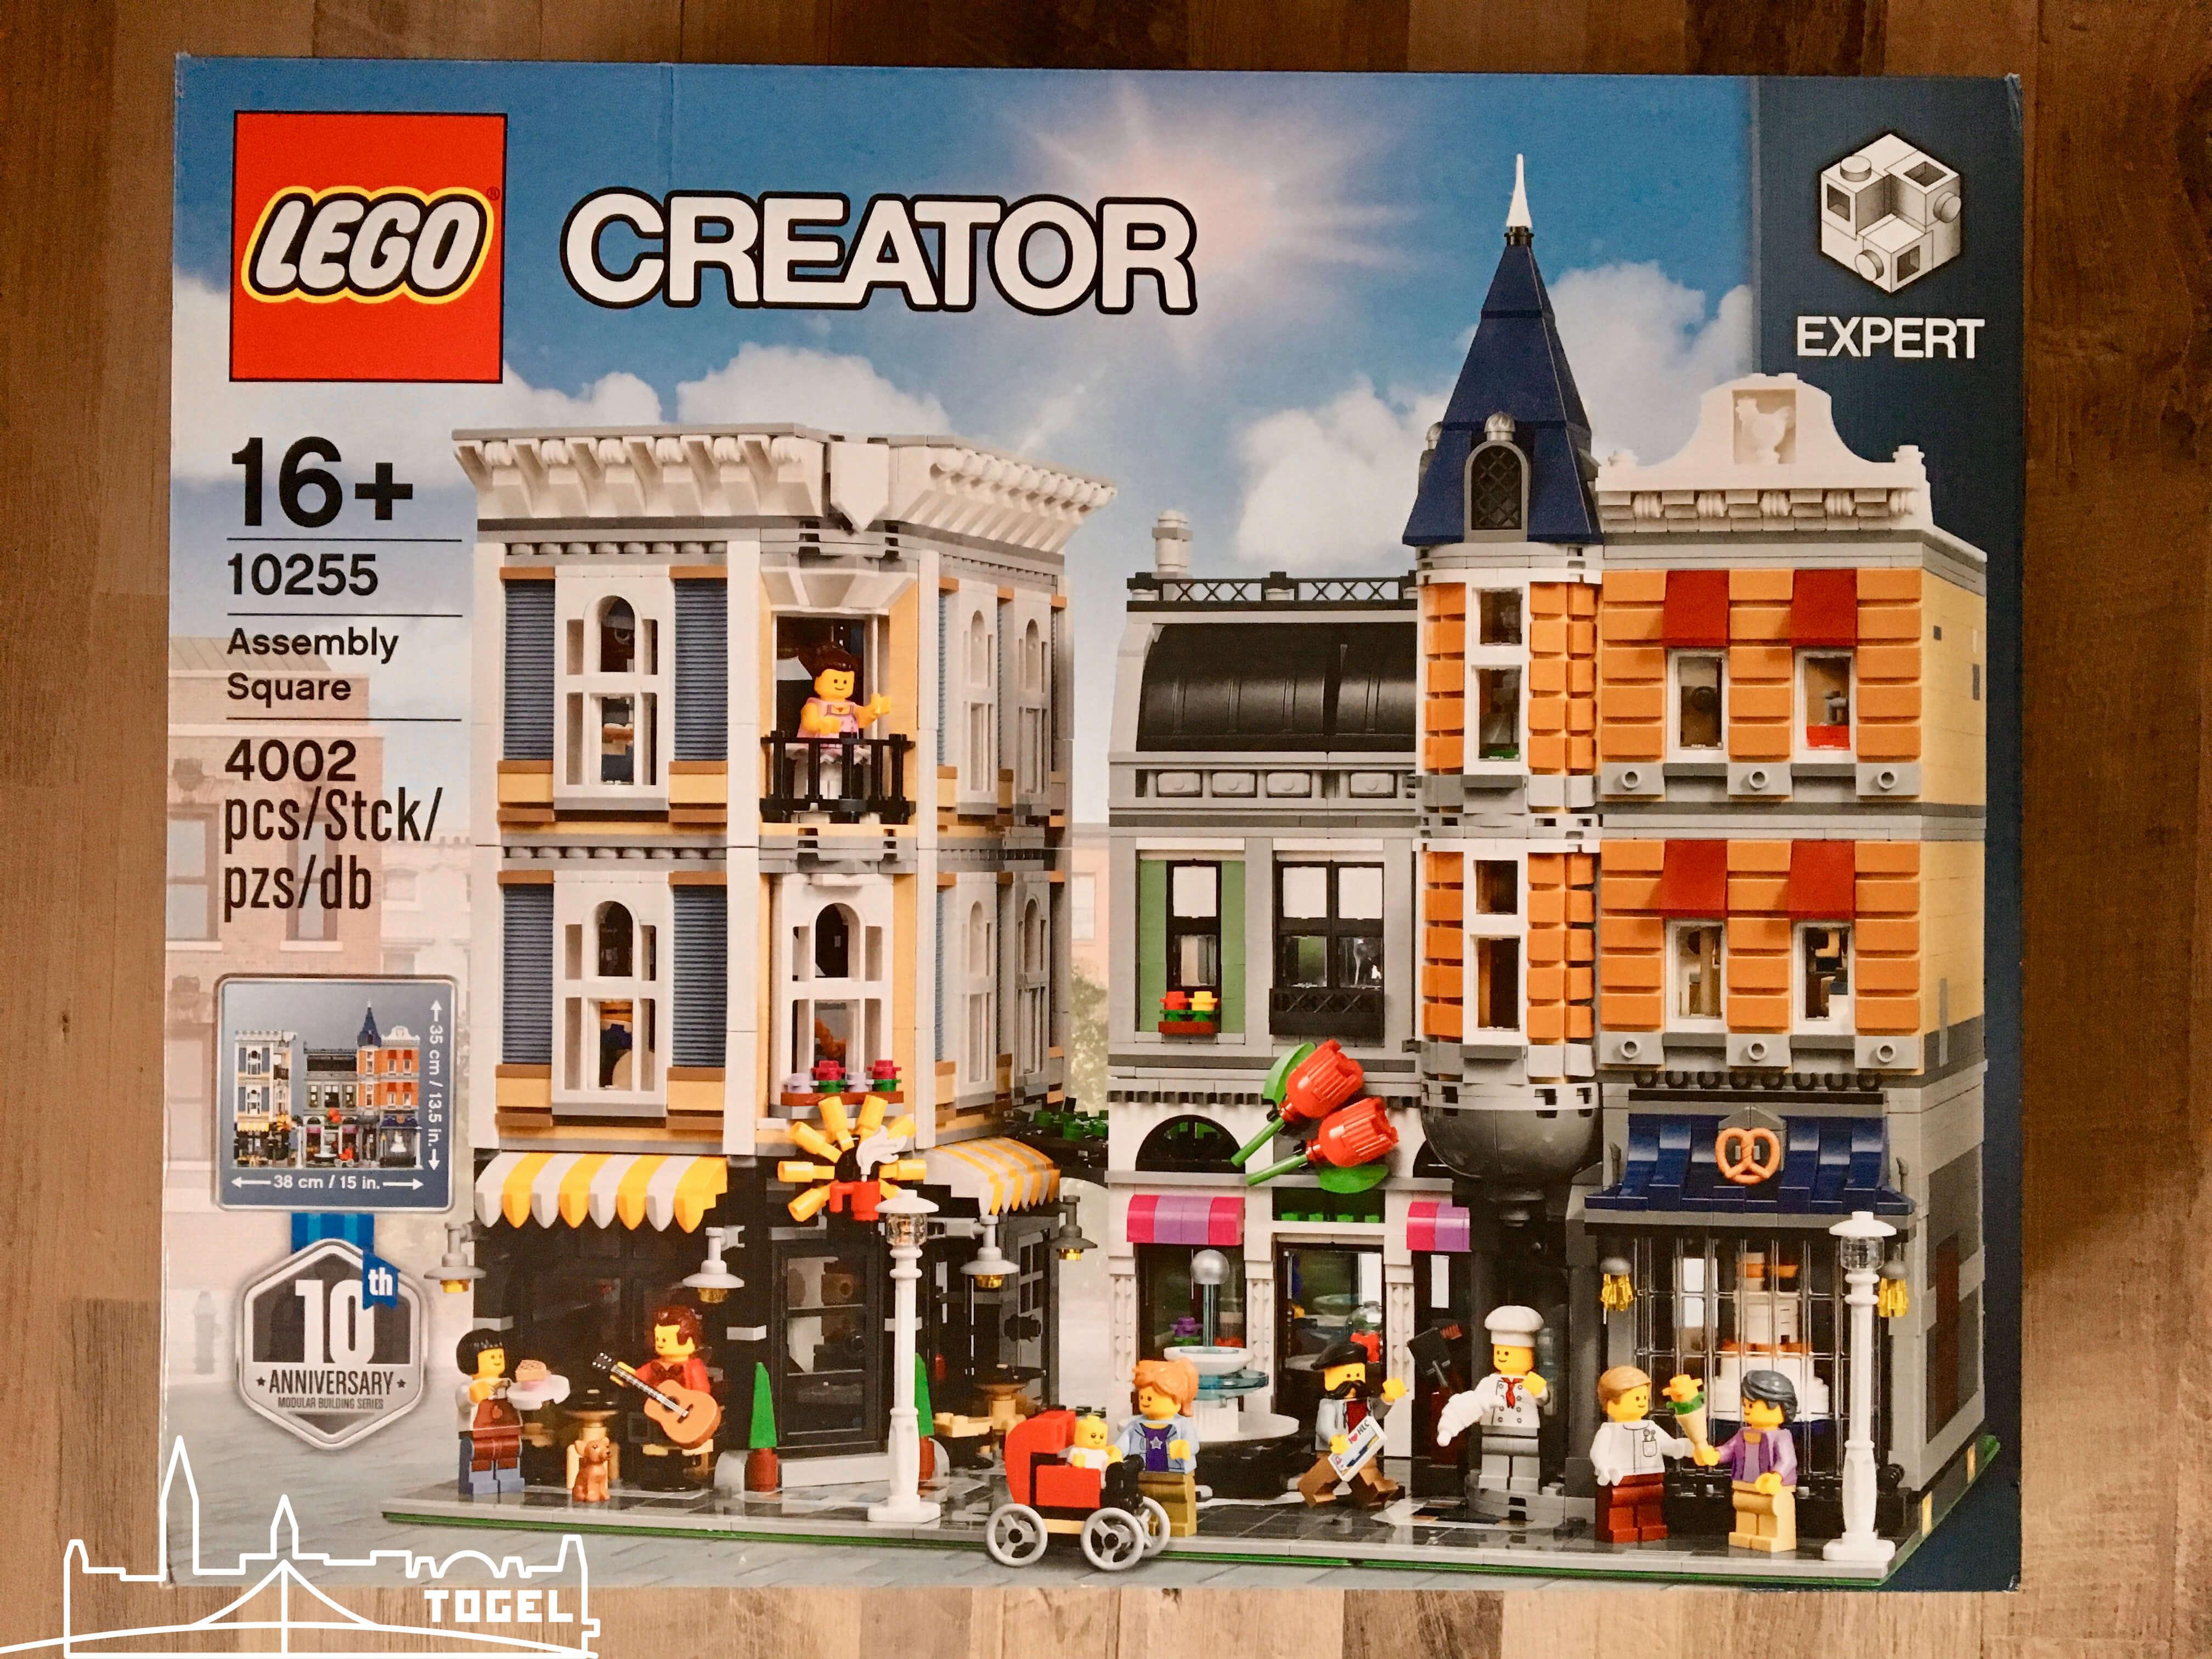 Lego Creator Stadtleben Assembly Square 10255 zählt zu den 5 besten Lego Sets 2017